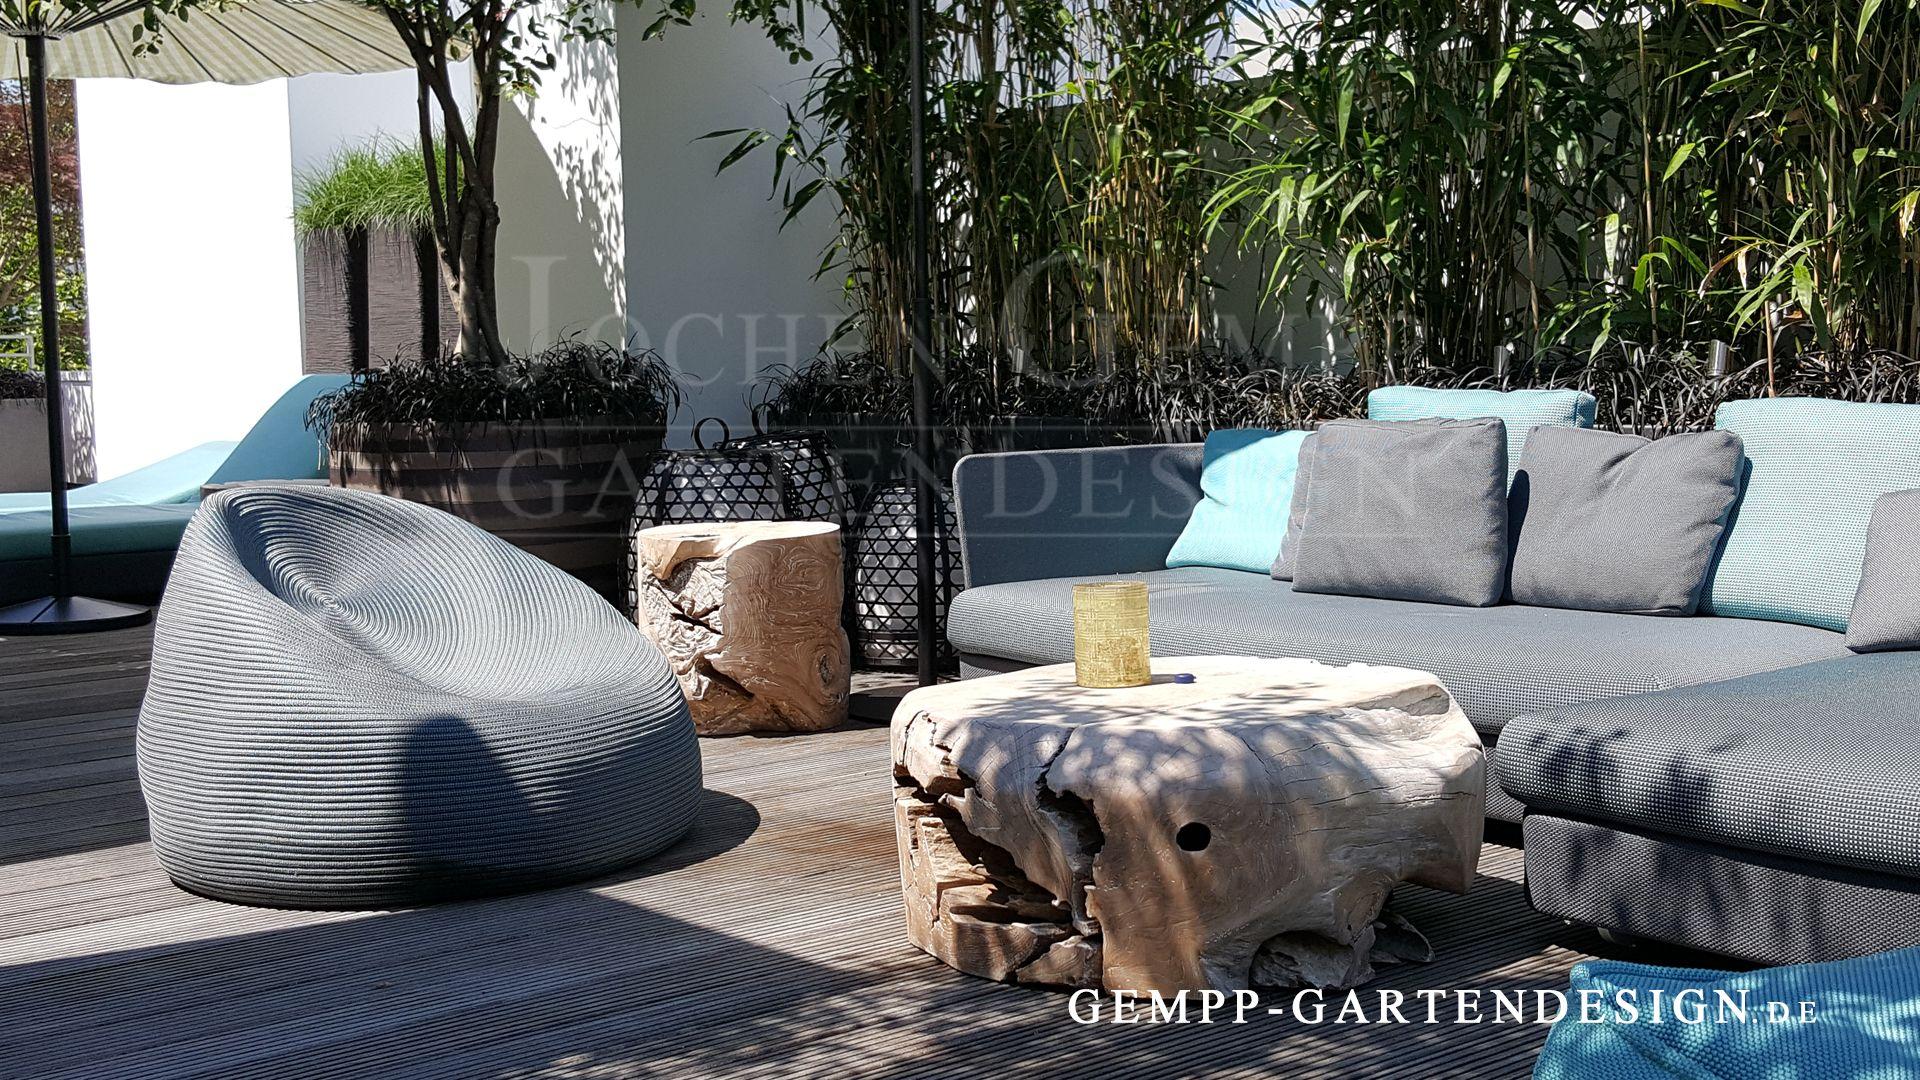 Dachterrassengestaltung Gempp Gartendesign Dachterrassen Dachterrassengestaltung Gartenmobel Design Terrassengestaltung